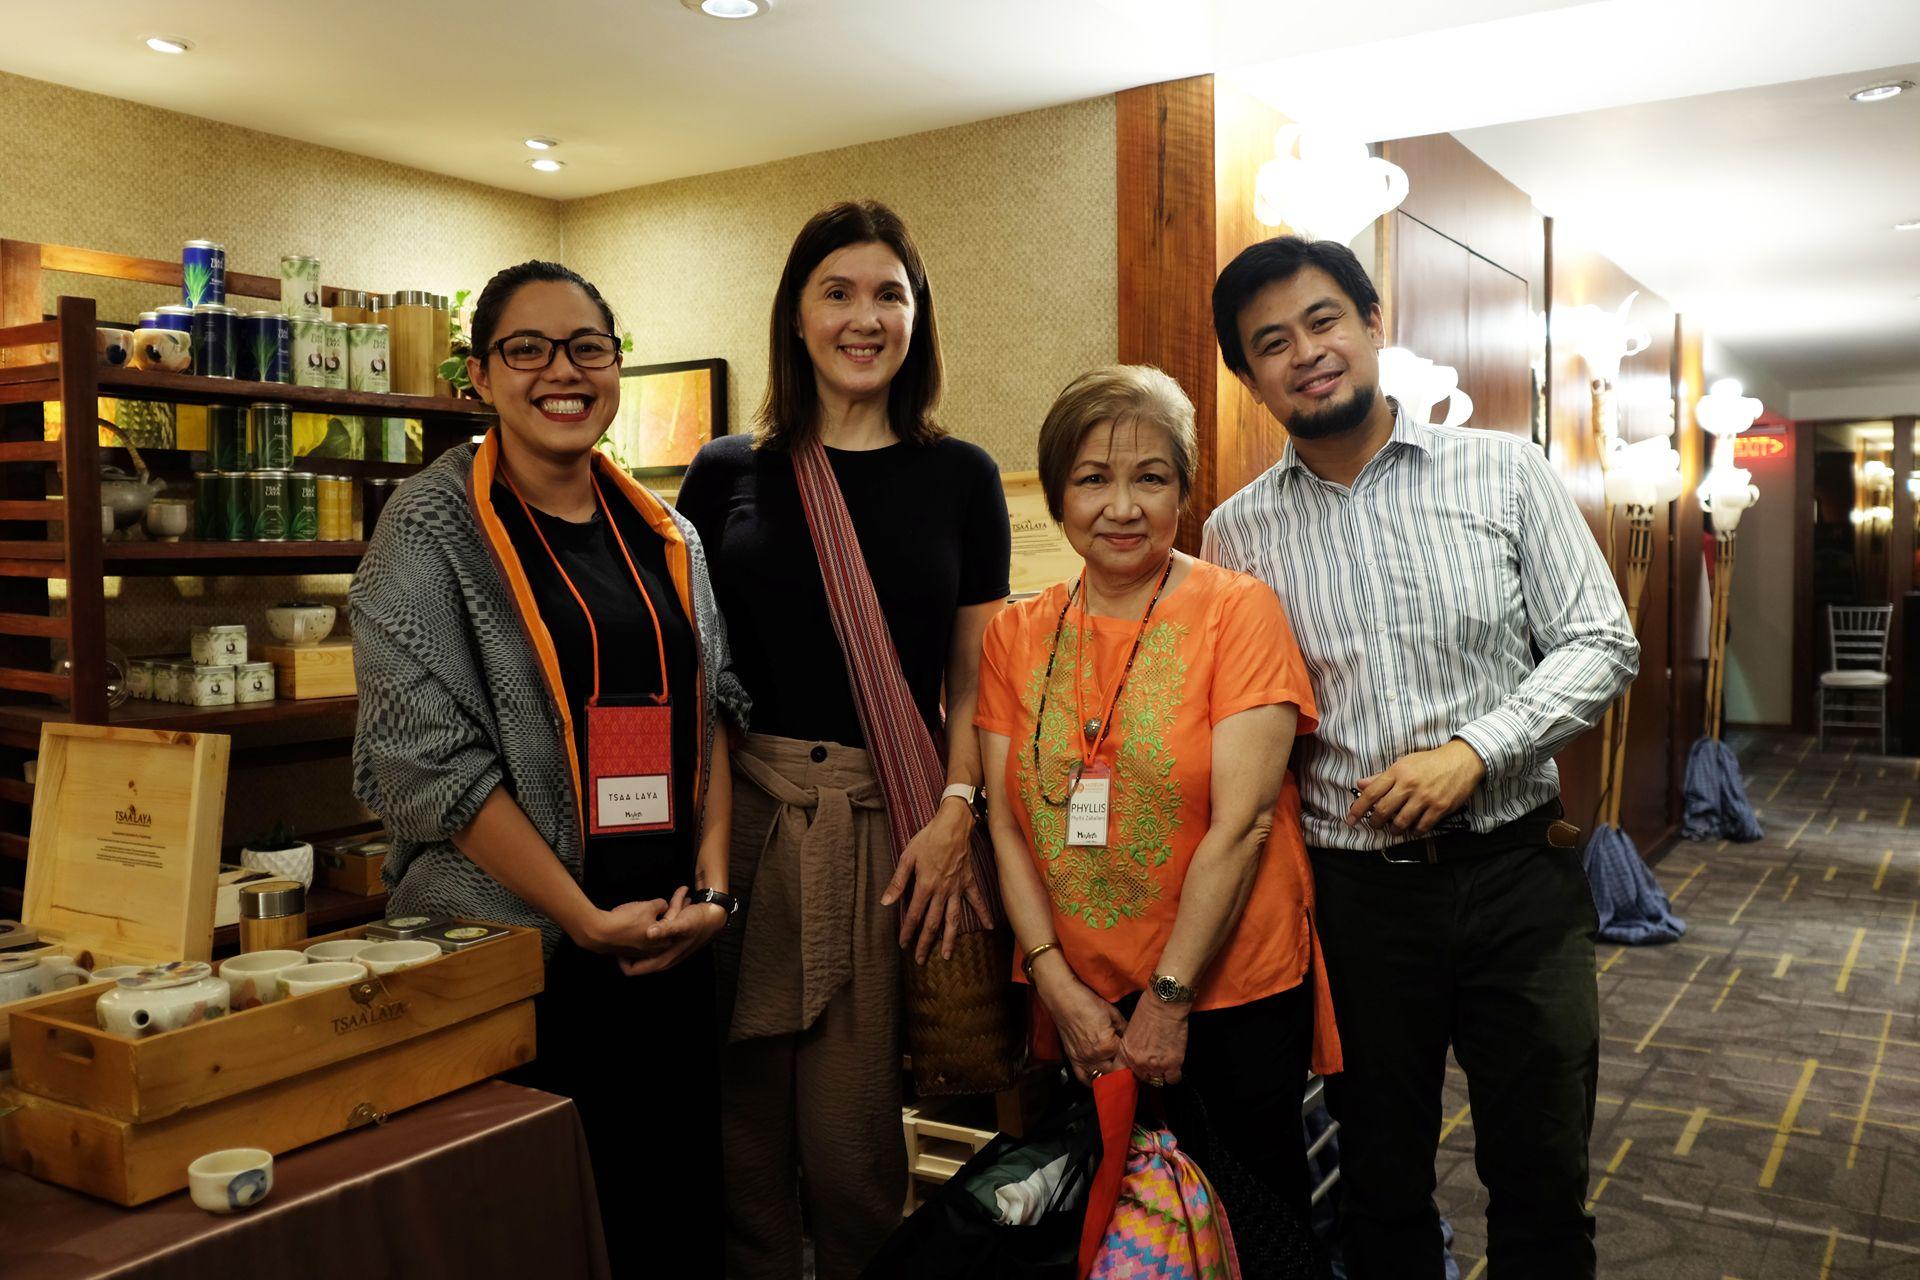 Senator Pia Cayetano and MFPI's Phyllis Zaballero flanked by Denise Subido and Jamir Ocampo of Tsaa Laya